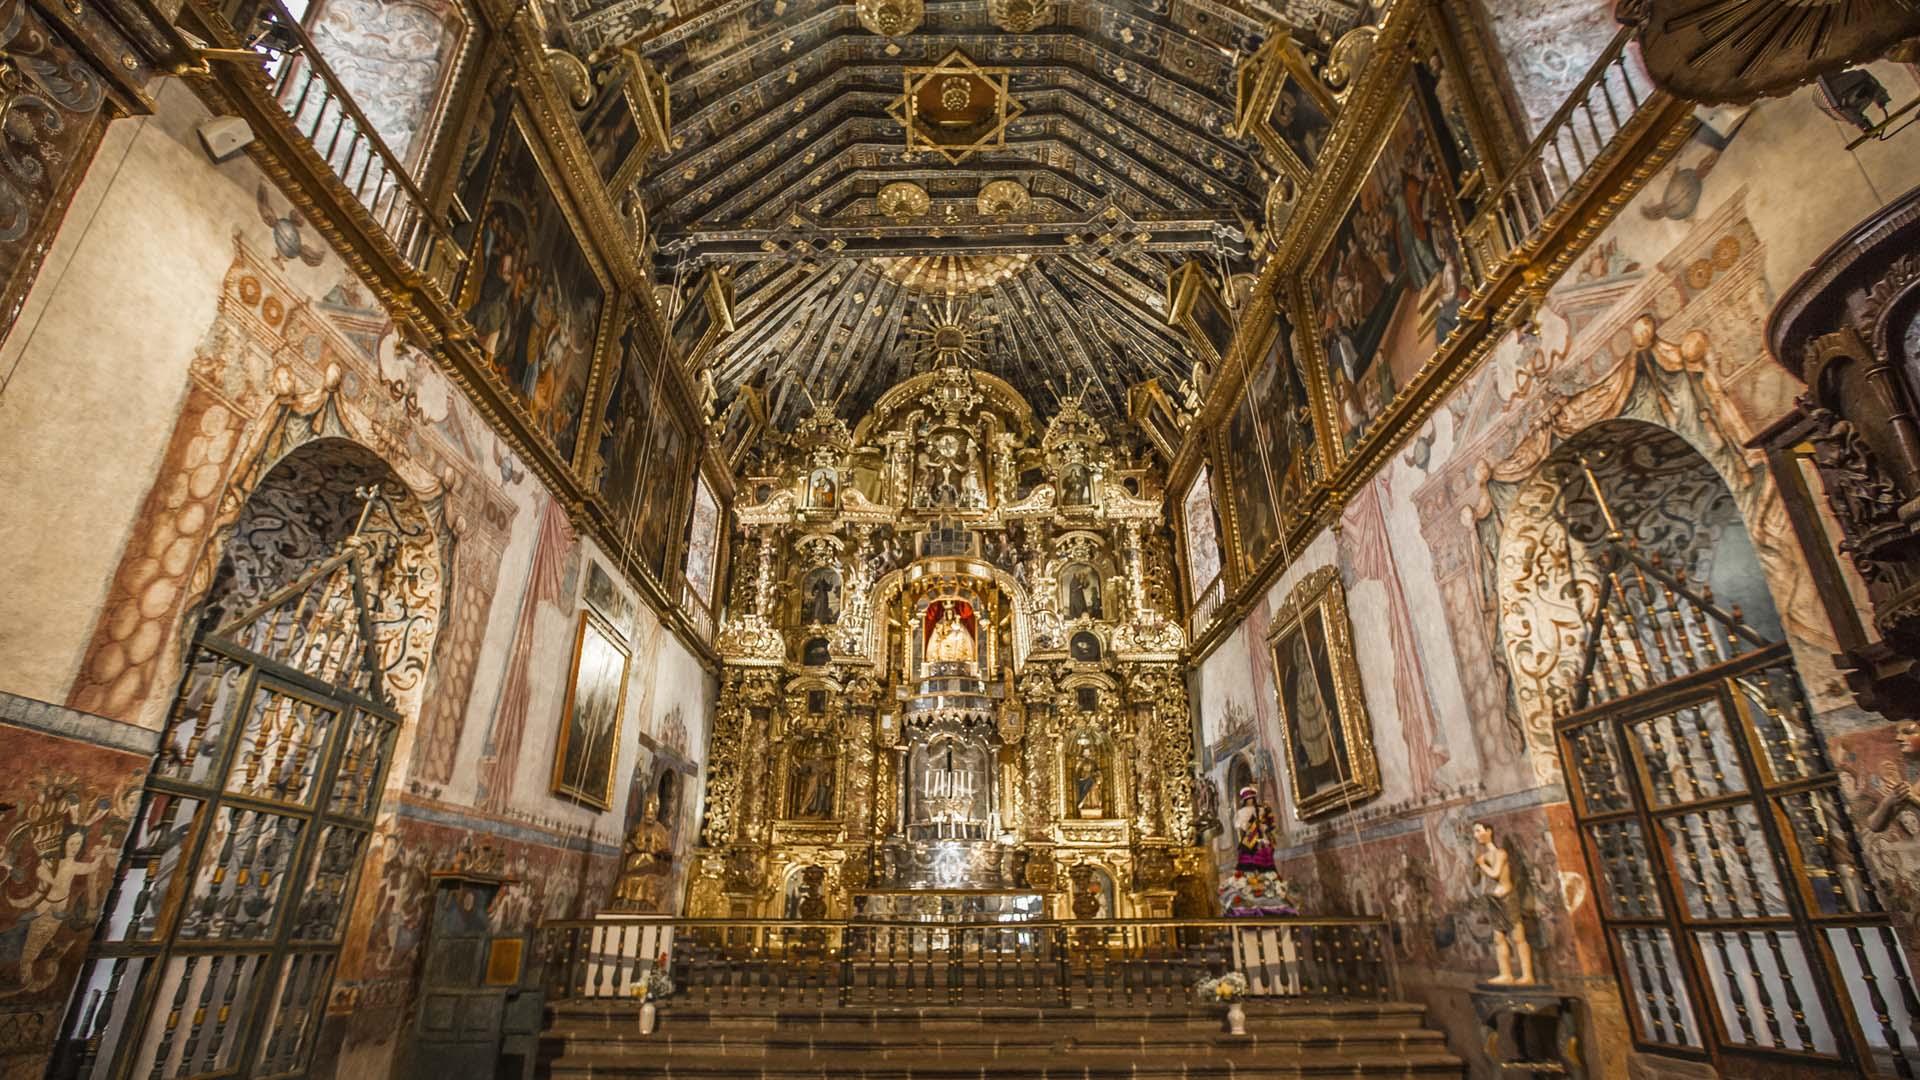 Ruta-del-Barroco-Andino-San-Pedro-Apóstol-de-Andahuaylillas-04